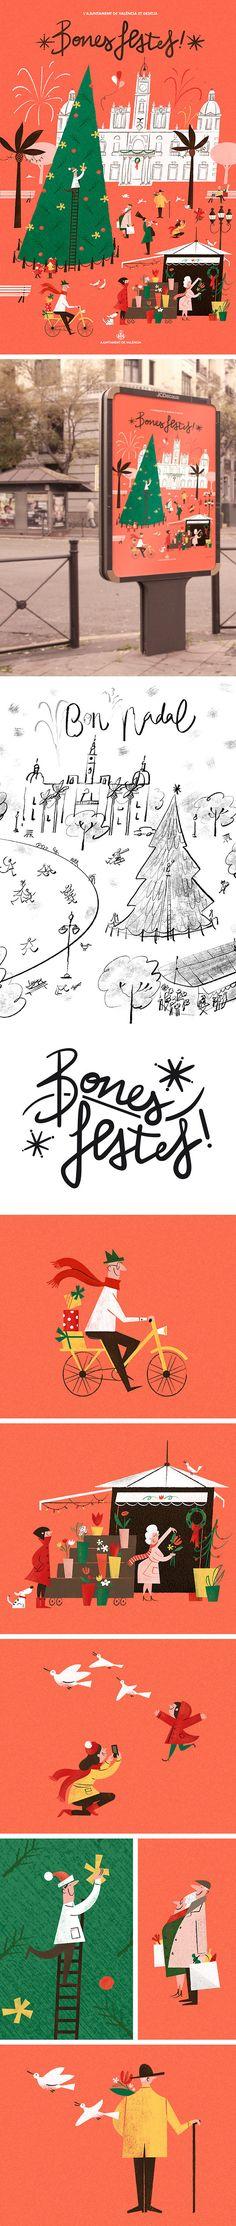 "Bekijk dit @Behance-project: ""Season's Greetings 2016"" https://www.behance.net/gallery/46242203/Seasons-Greetings-2016"